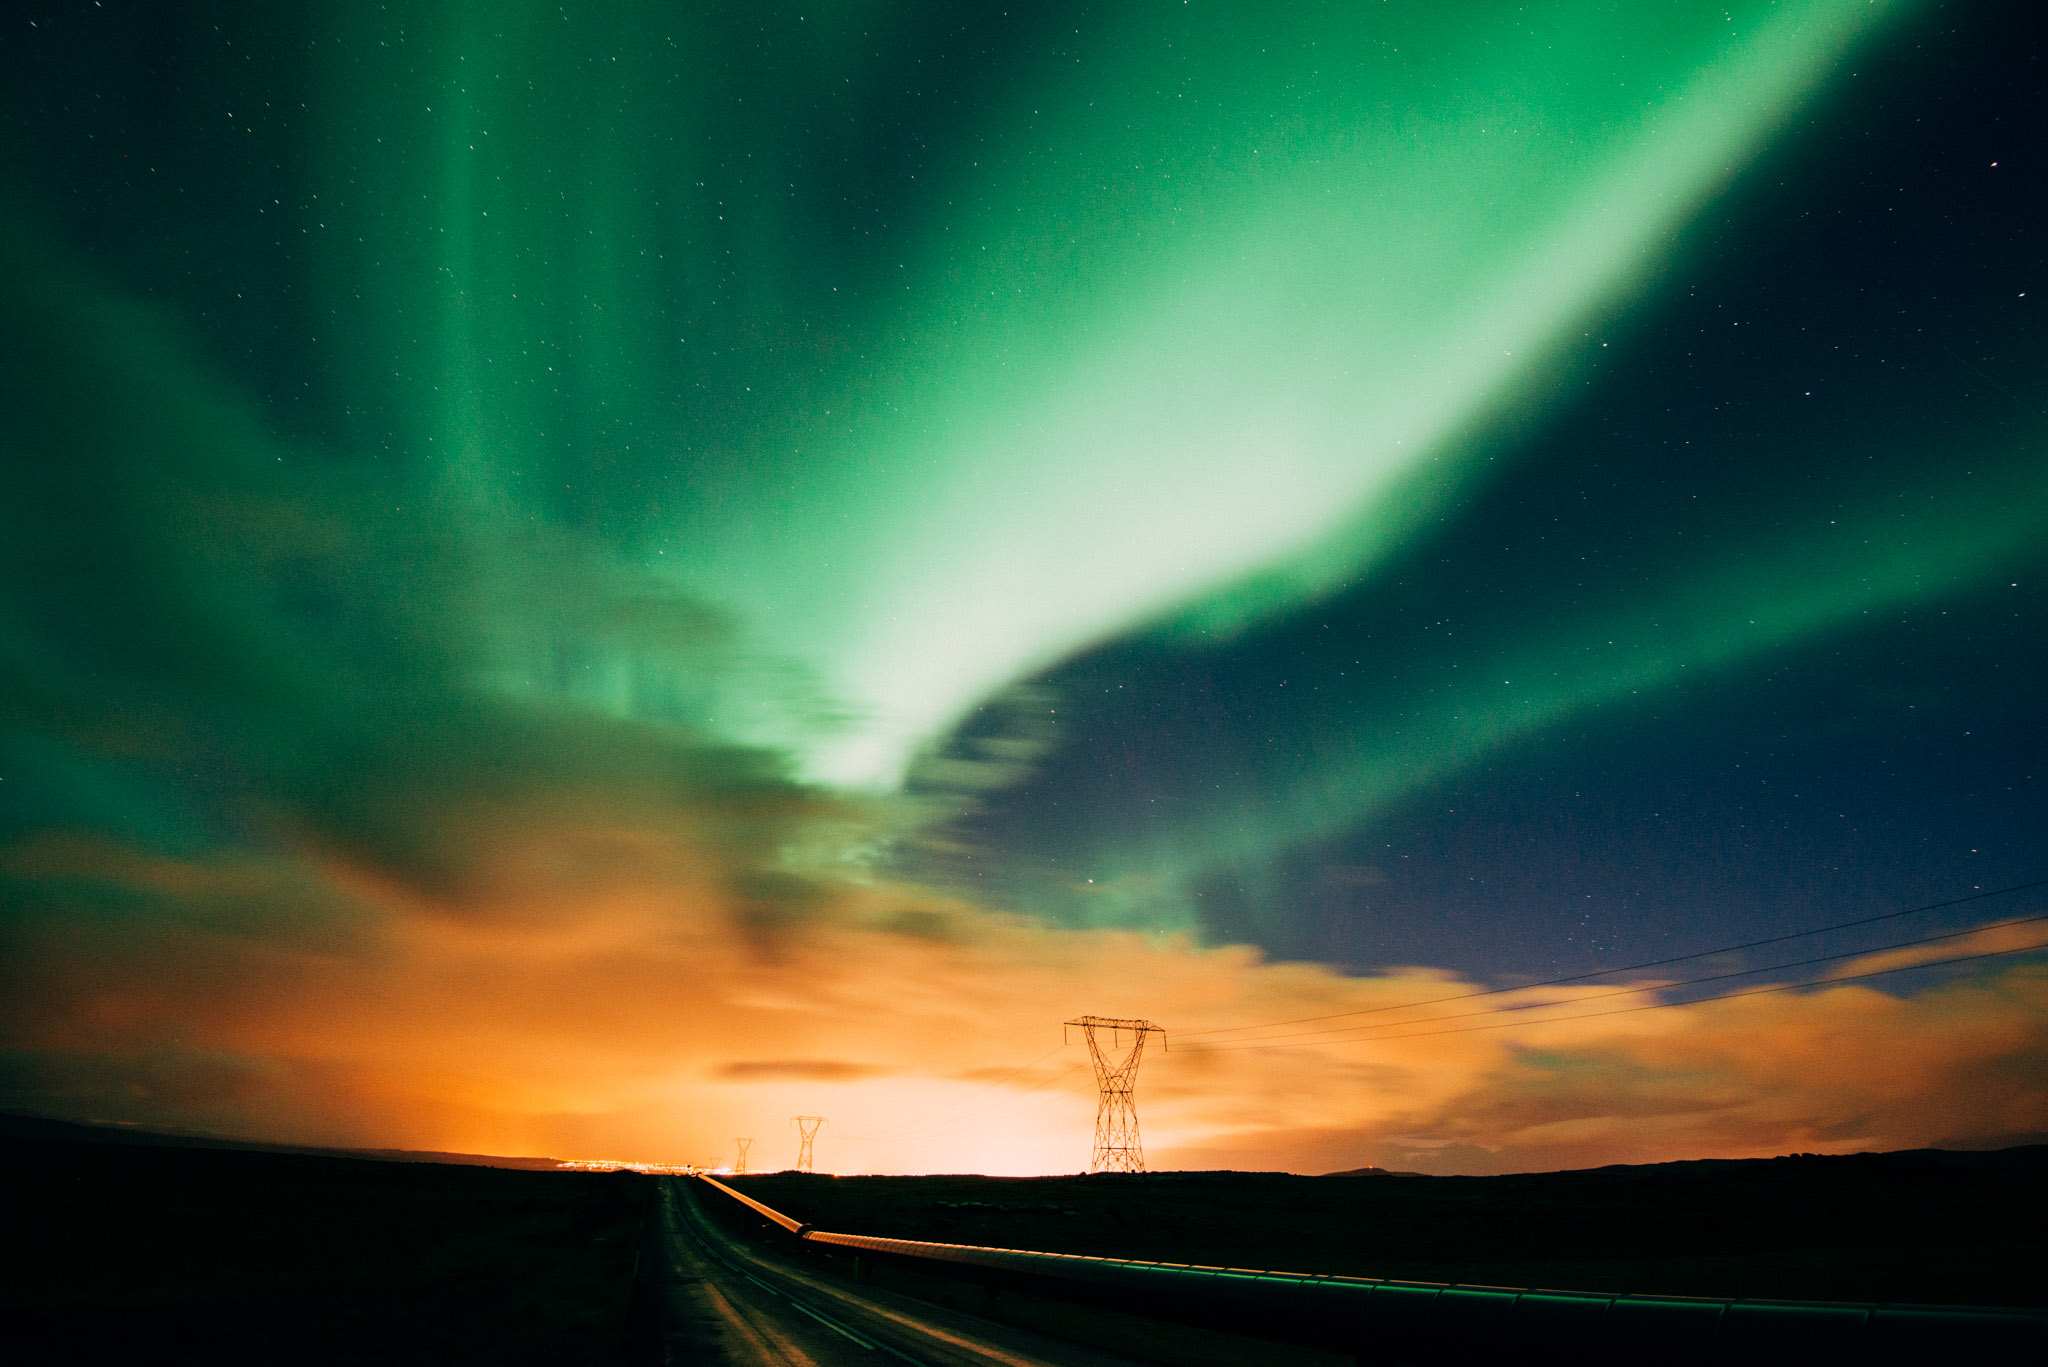 iceland-aurora-4377-pete-carr